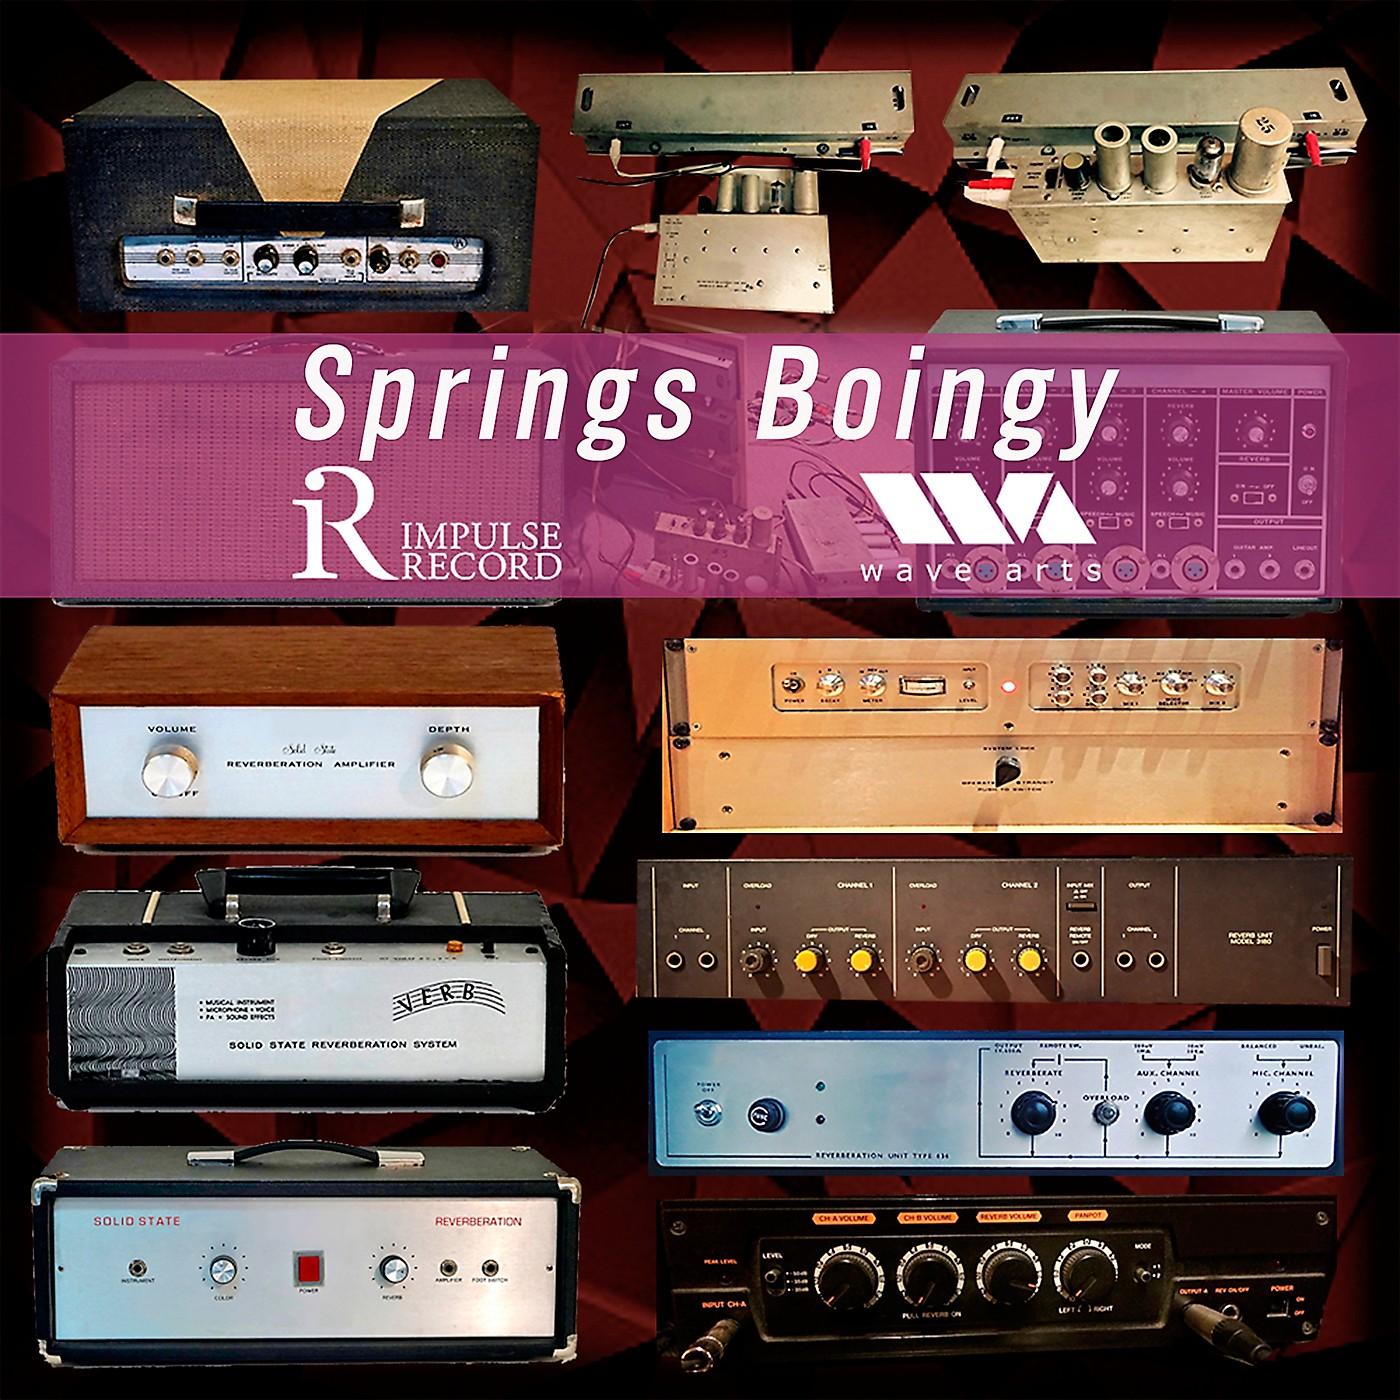 Impulse Record Springs Boingy thumbnail